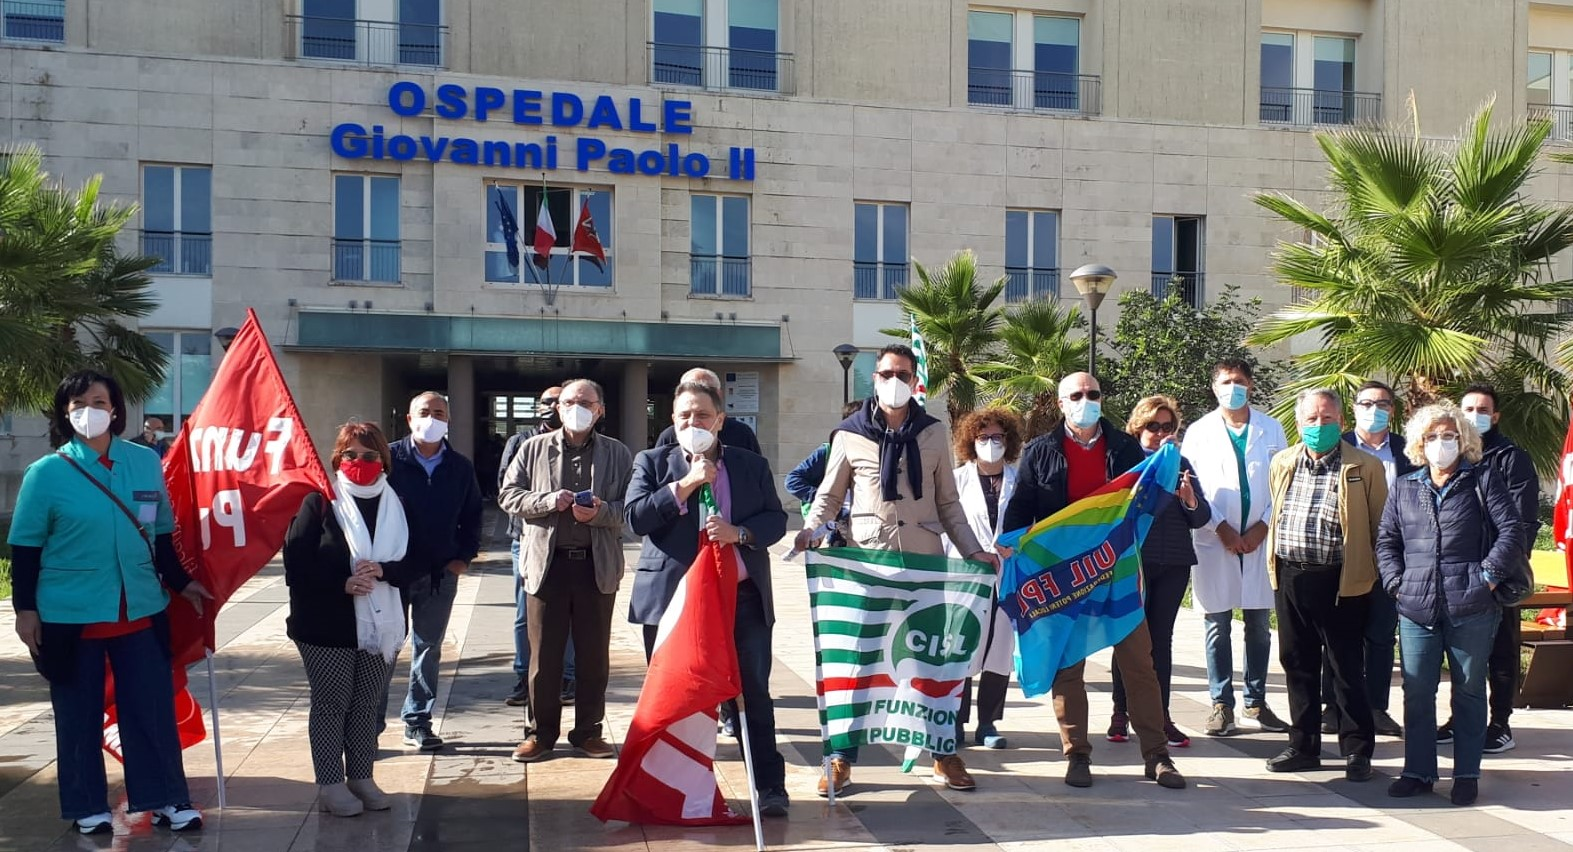 Emergenza sanità, a Ragusa mobilitazione dei rappresentanti sindacali dei servizi pubblici